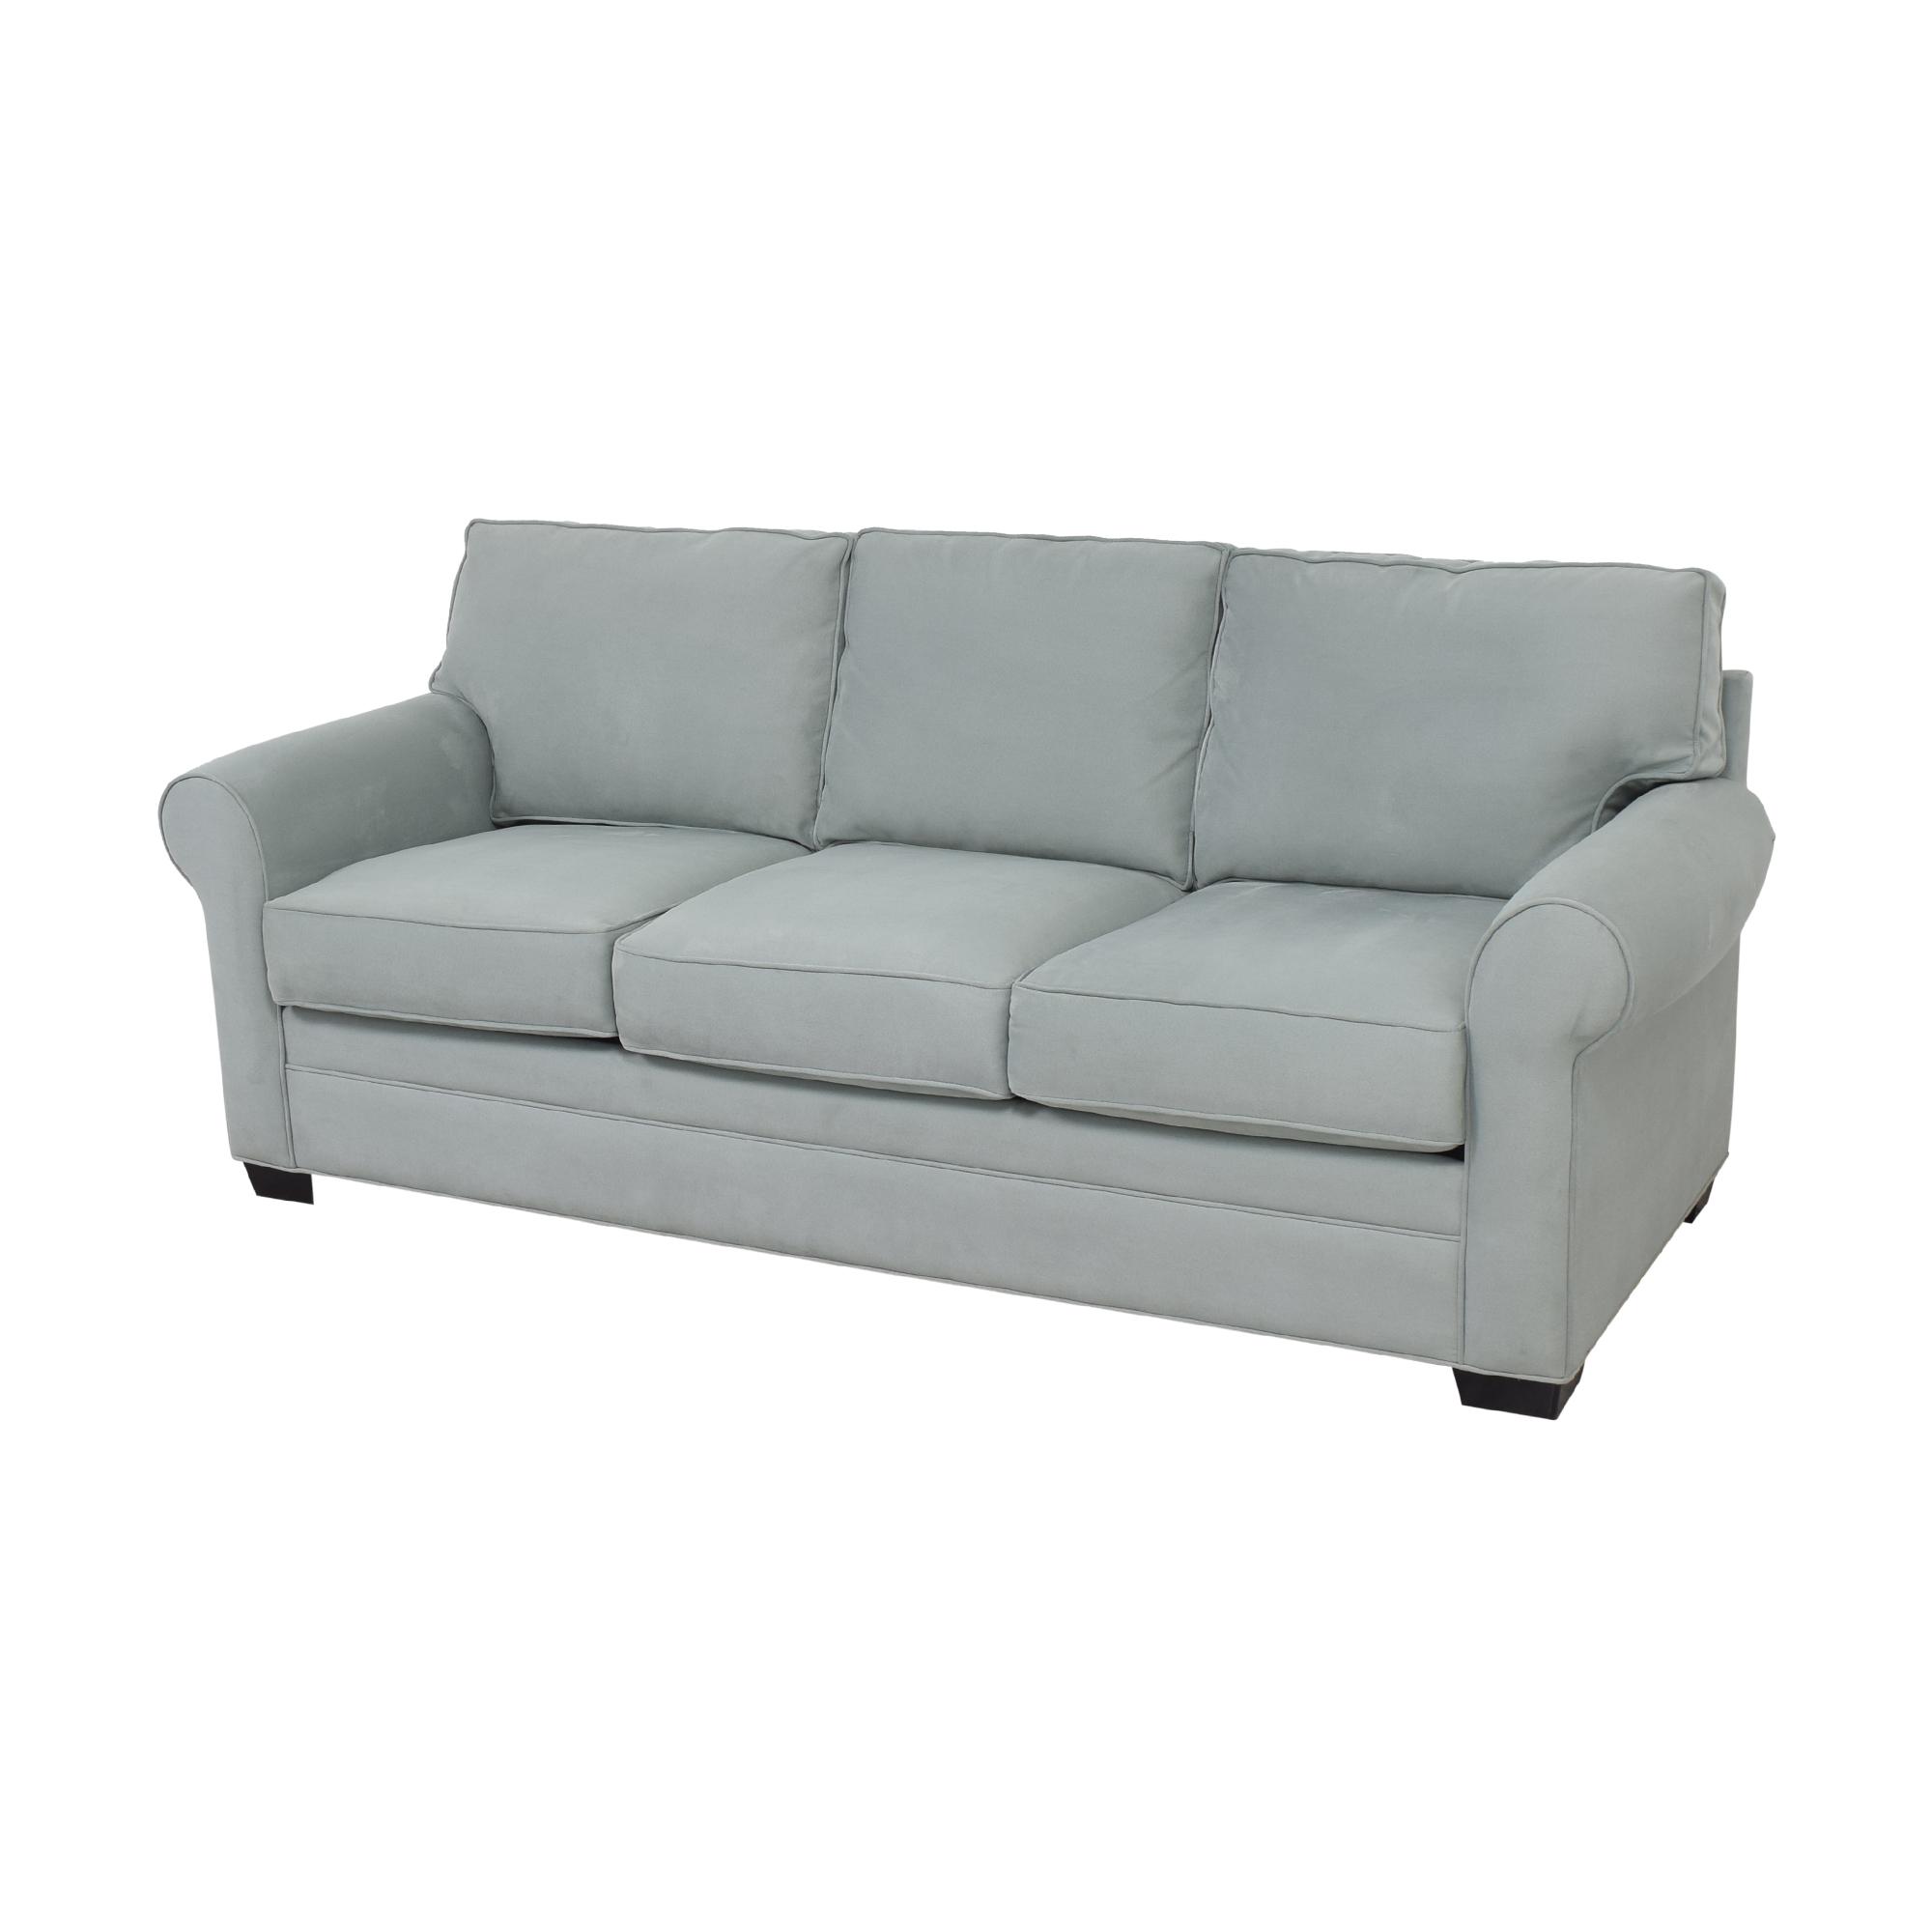 Raymour & Flanigan Raymour & Flanigan Cindy Crawford Home Roll Arm Sofa Sofas